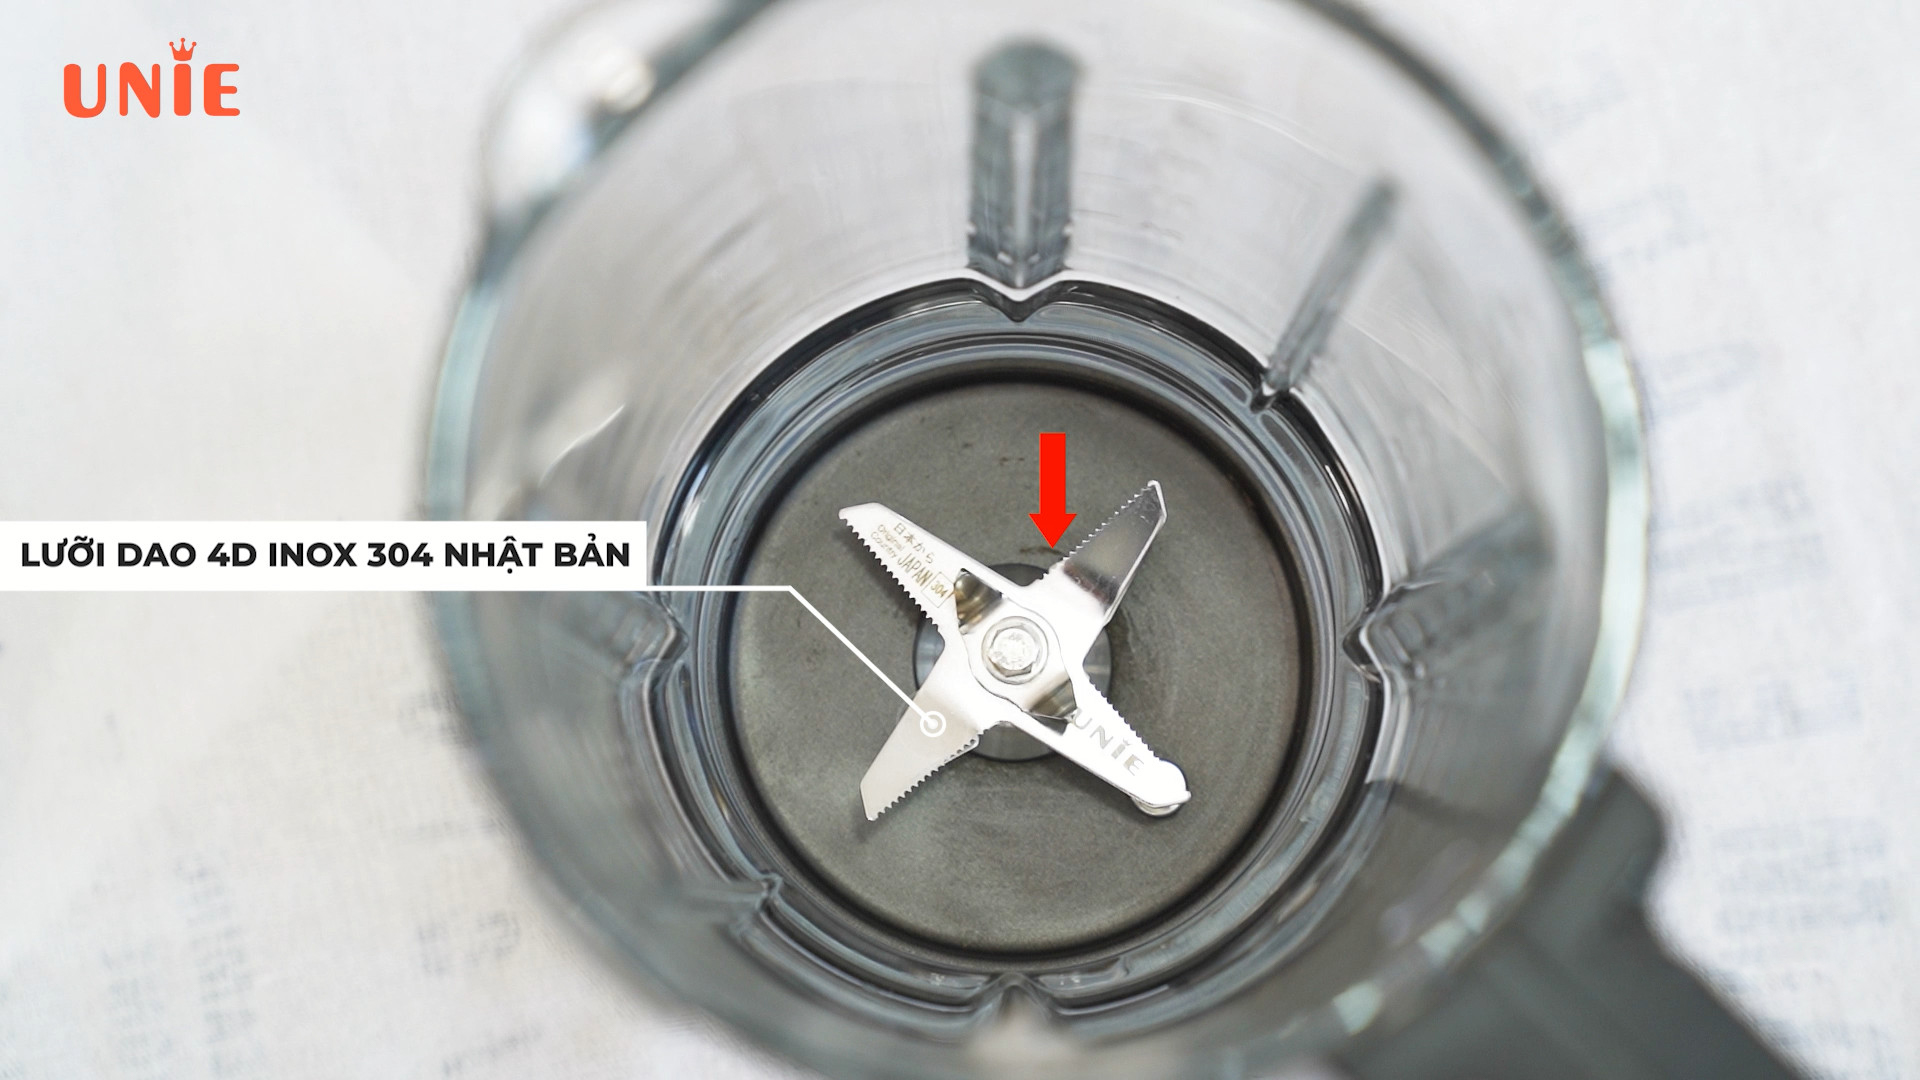 may-nau-sua-hat-unie-v6s-luoi-dao-4d-inox-304-tu-nhat-ban